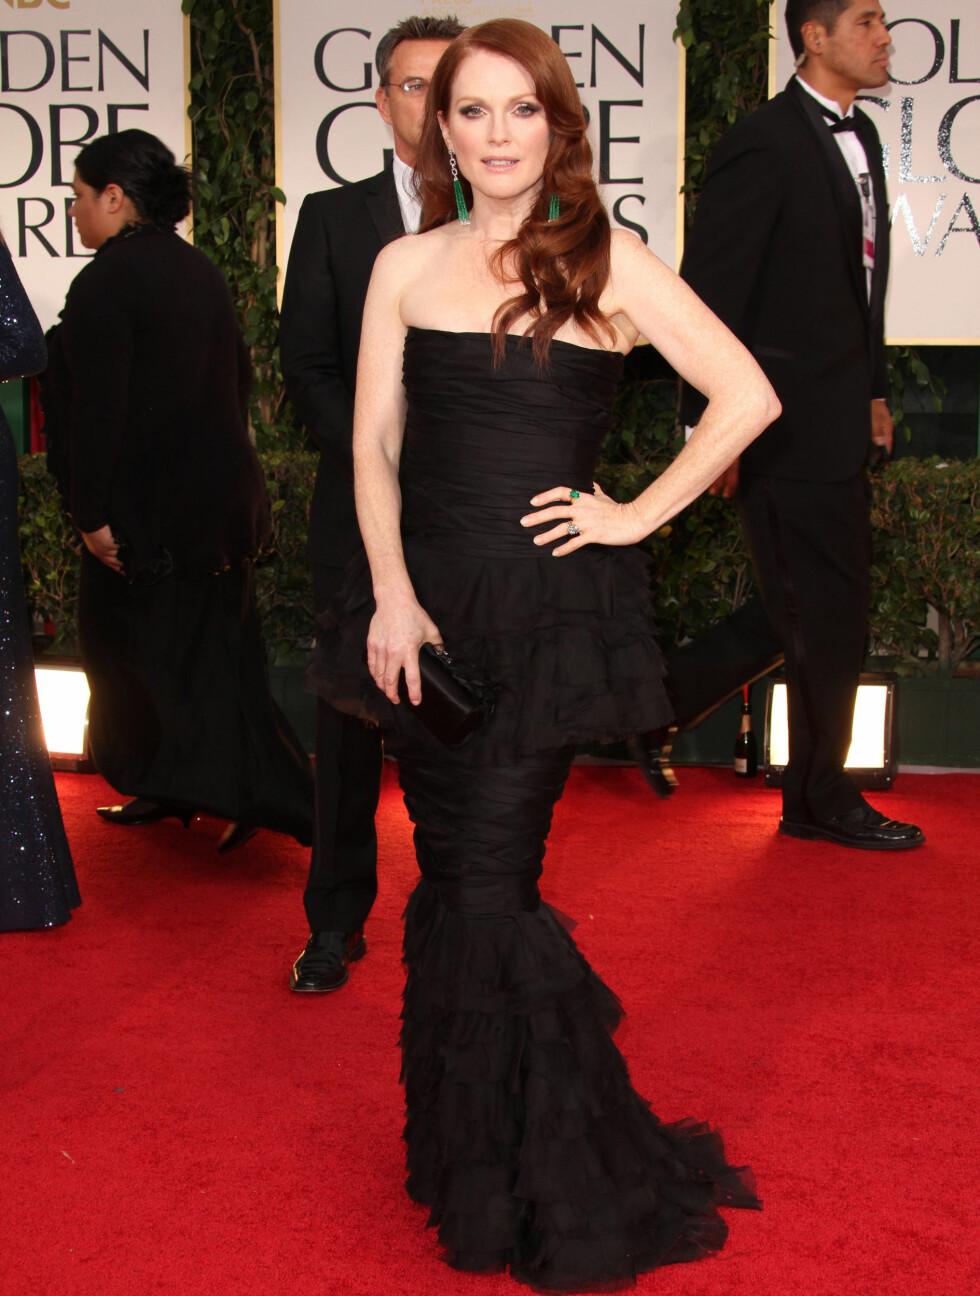 HAVFRUE: Julianne Moore var svært vakker i en sort kjole i havfruefasong.  Foto: Stella Pictures